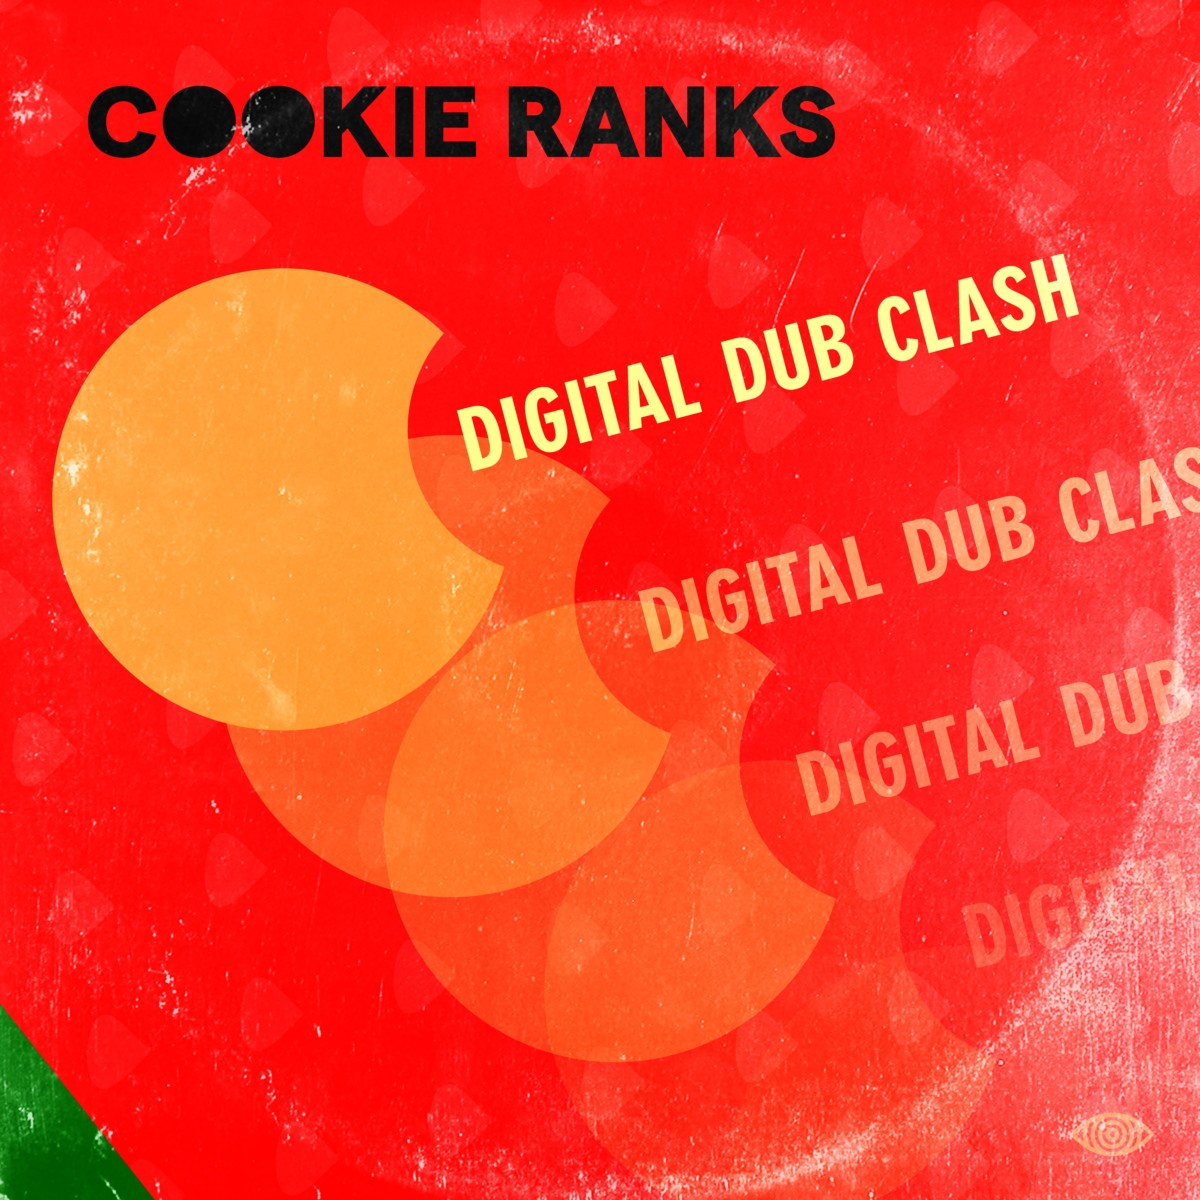 VIZLP4 Cookie Ranks - Digital Dub Clash